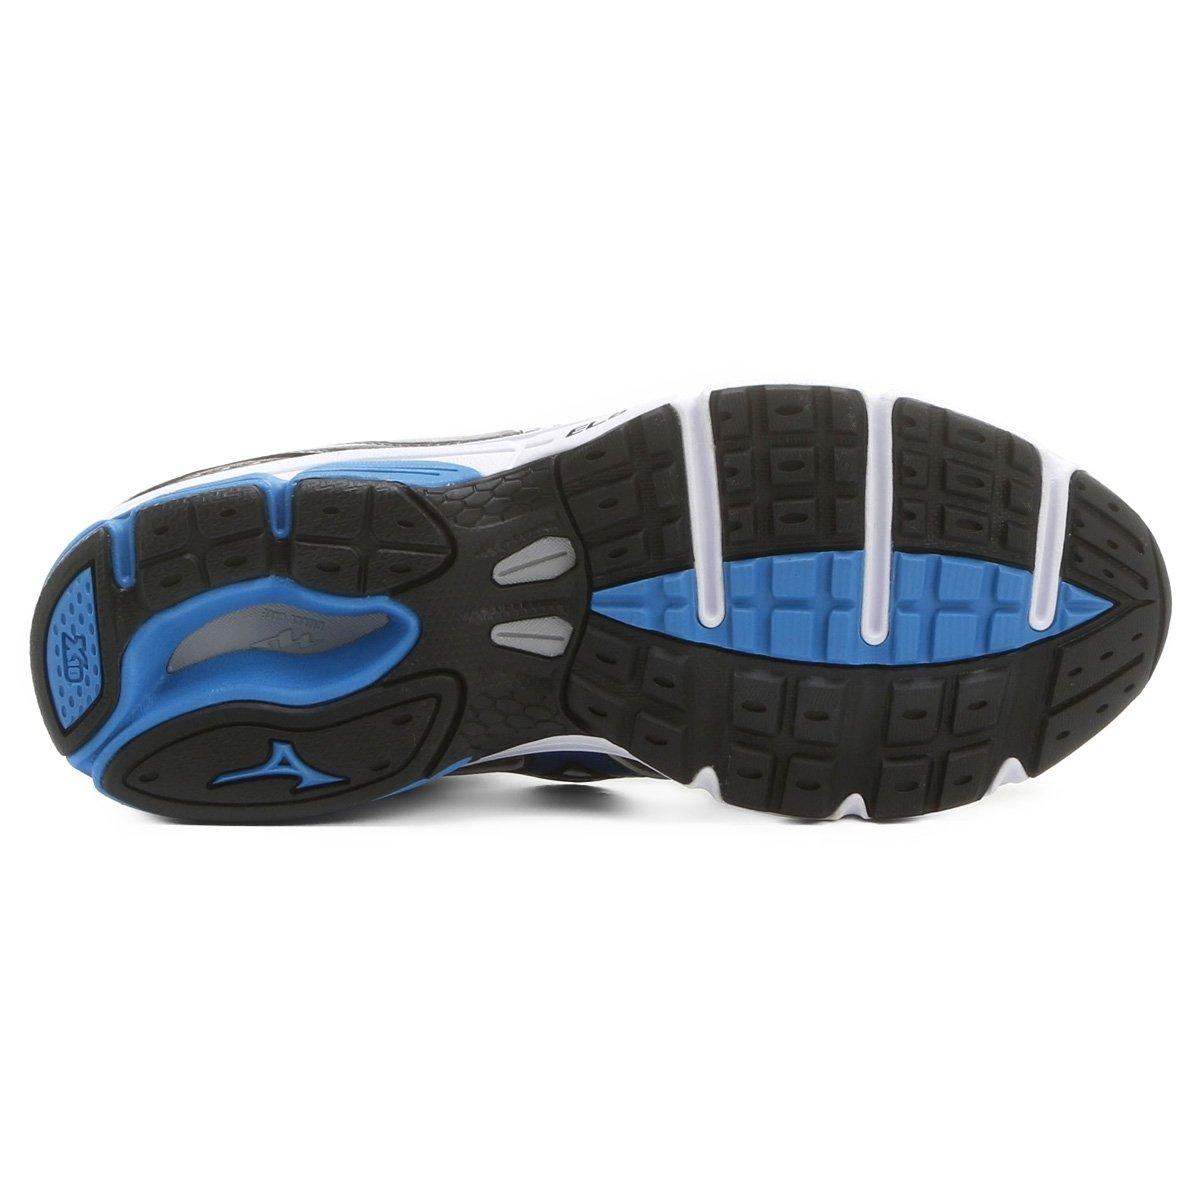 Tênis Mizuno Wave Impetus 4 - Grafite Azul - 38 - Compre Agora ... 618bde45df974